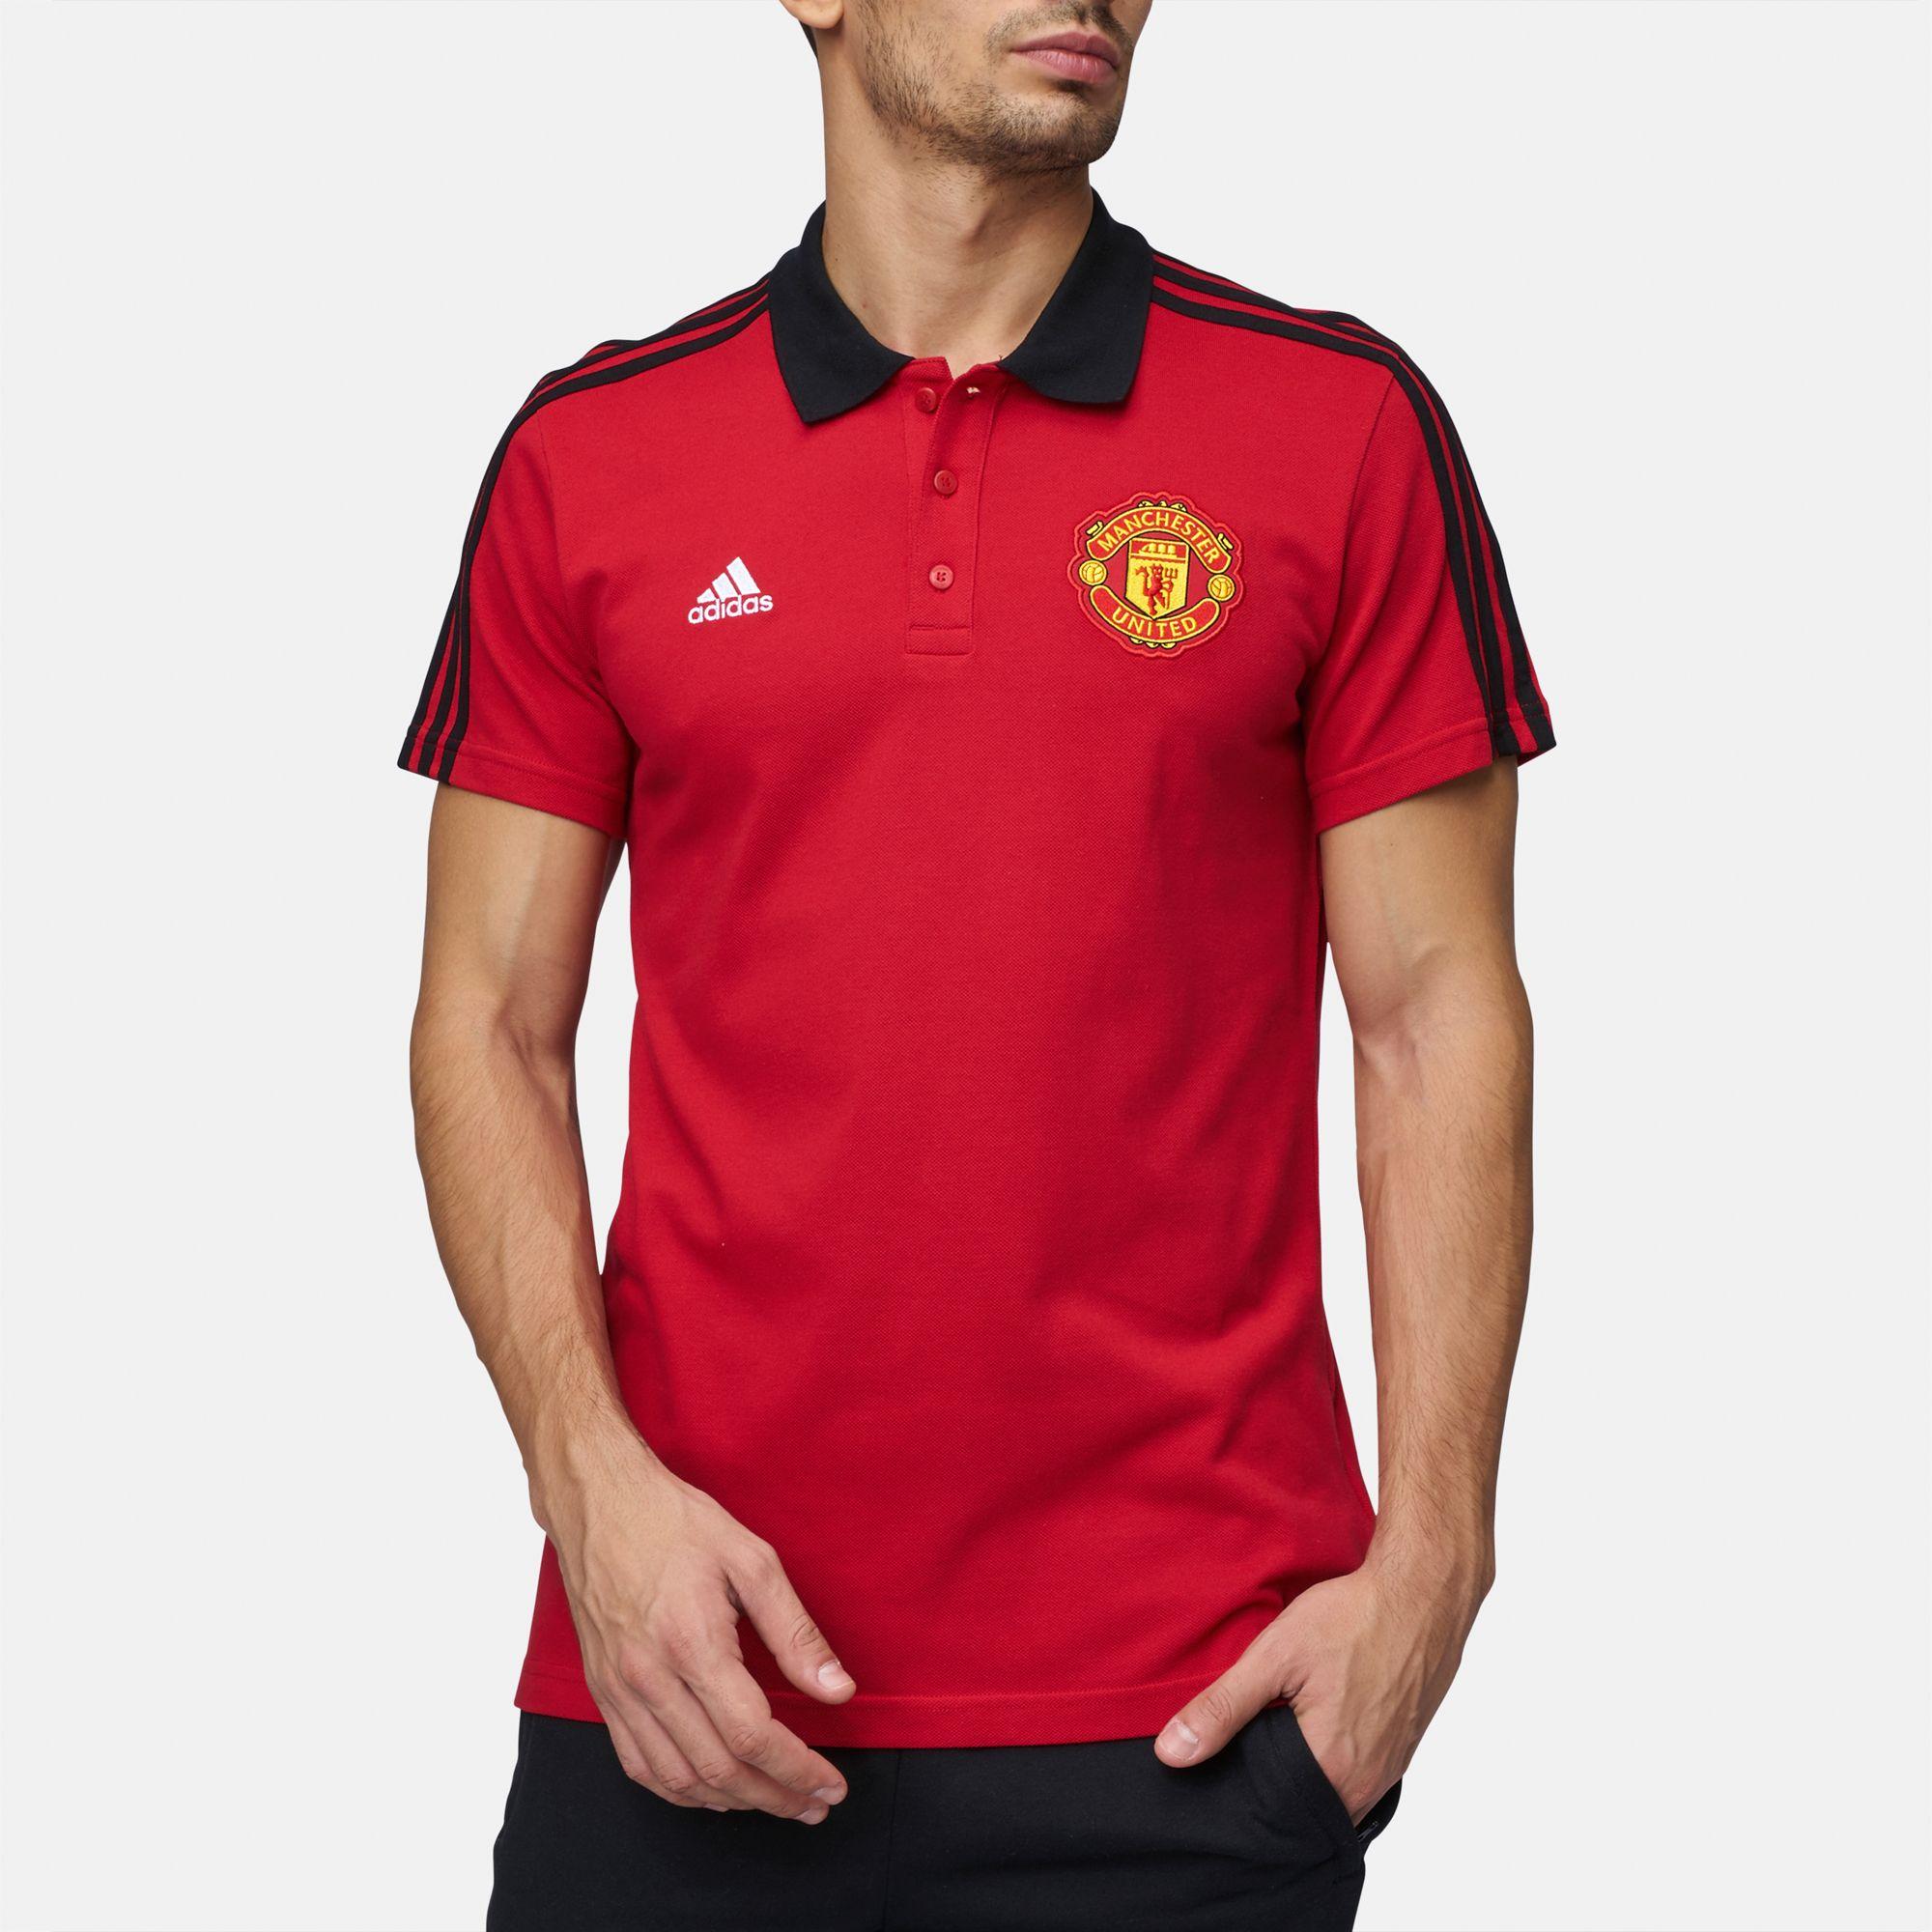 b7e7897e643 Shop Multi adidas Manchester United 3-Stripes Polo T-Shirt for Mens ...